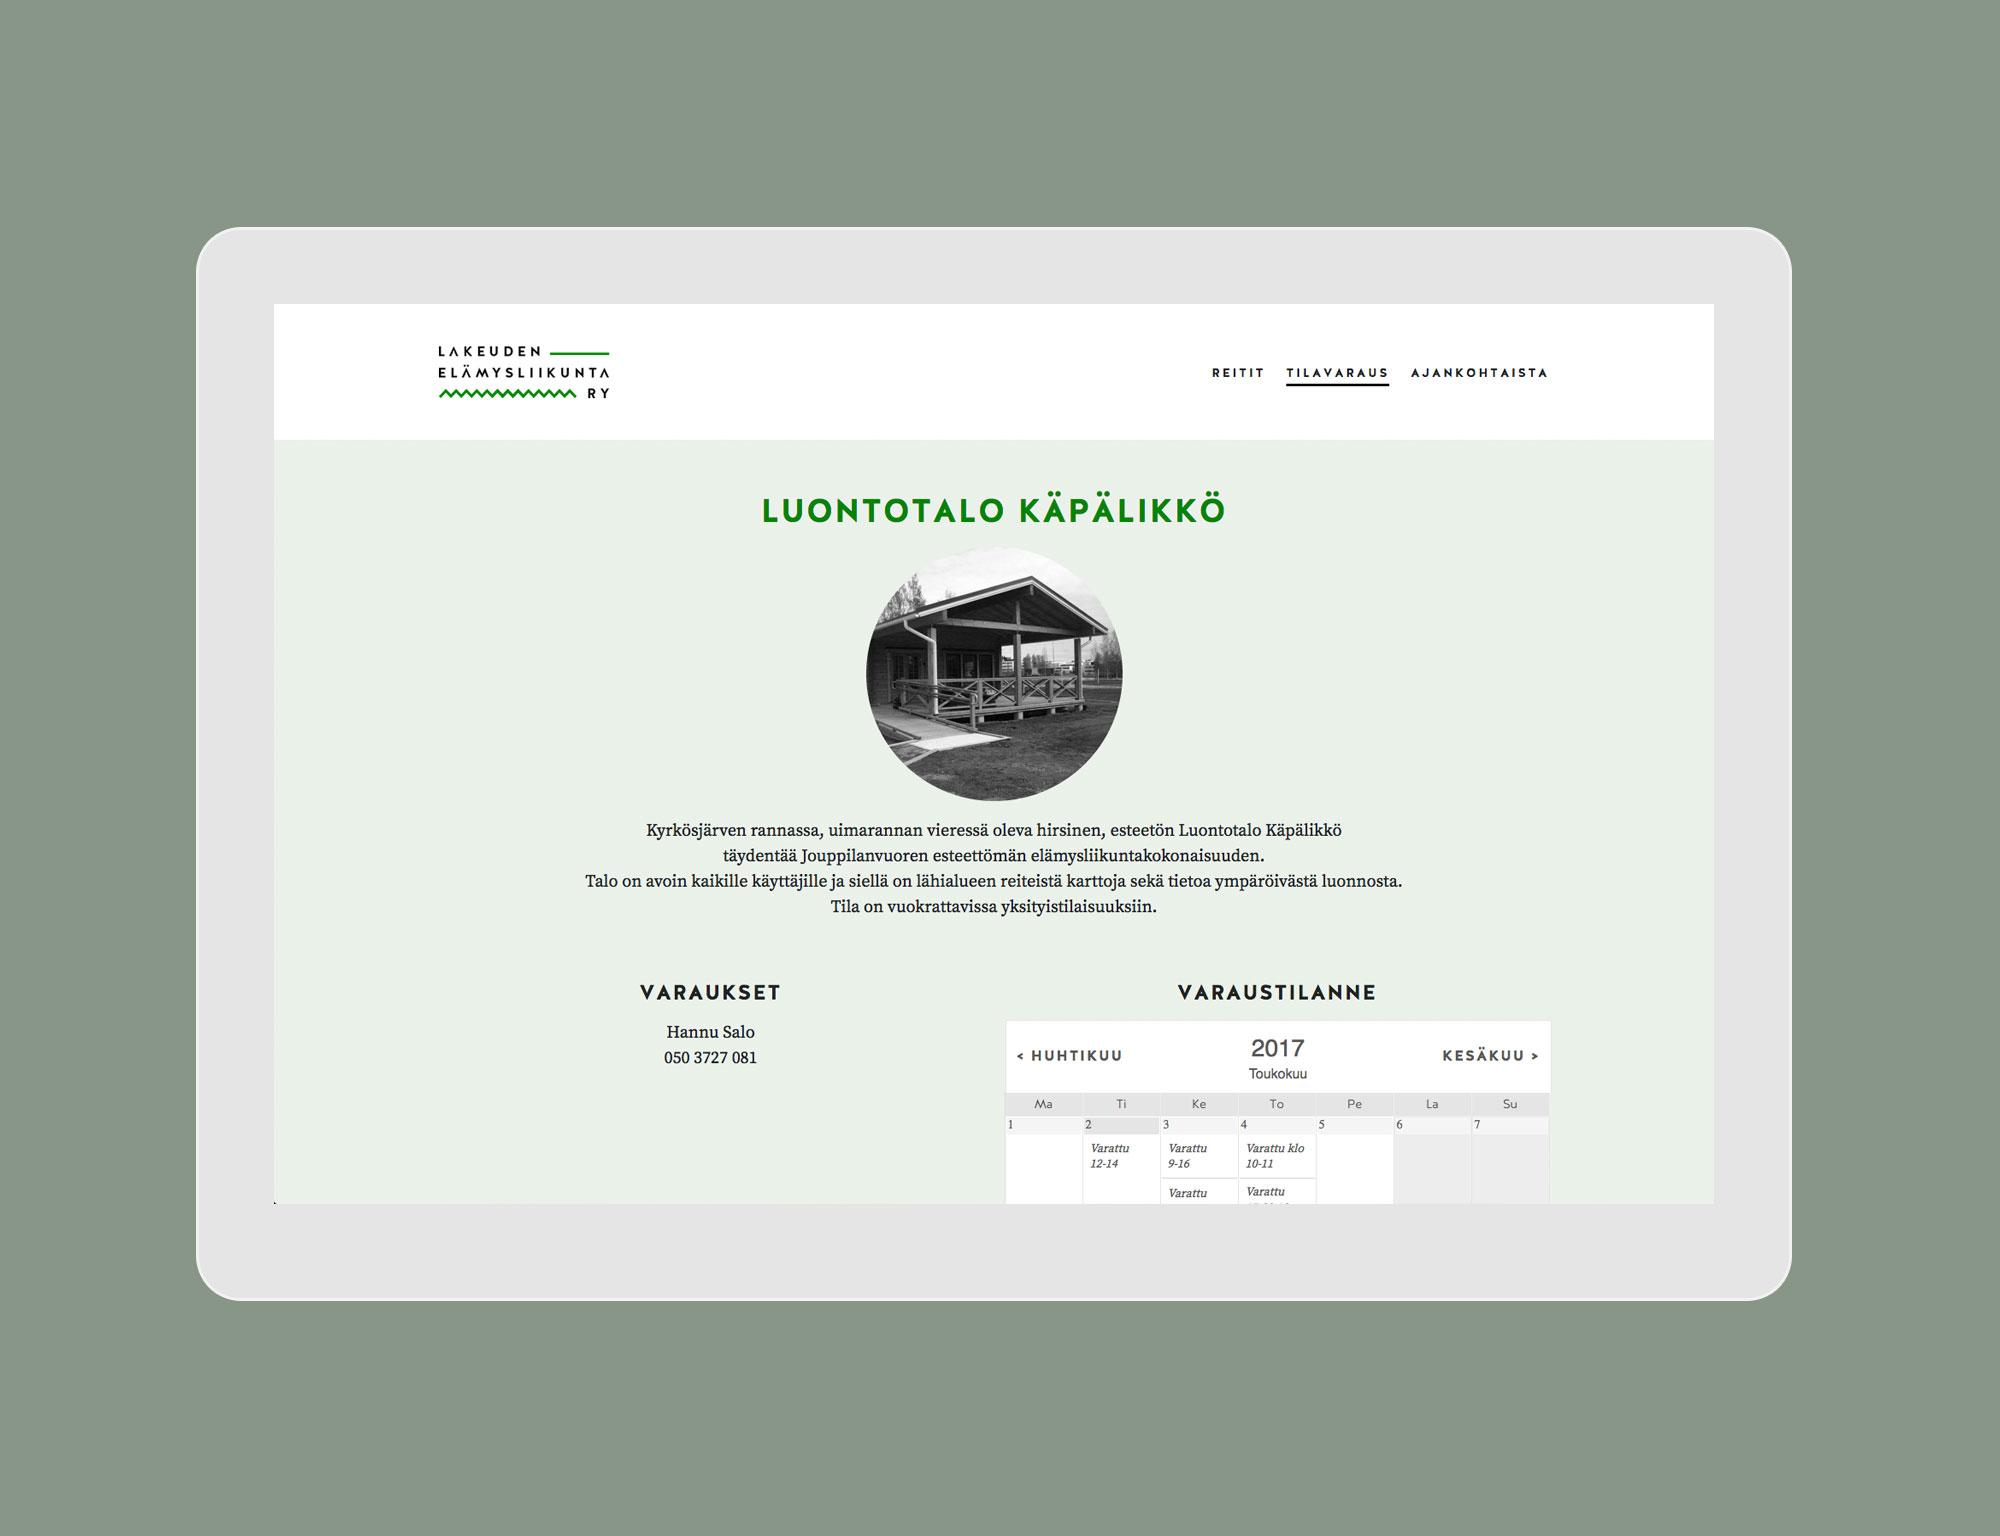 Lakeuden elämysliikunta: Booking